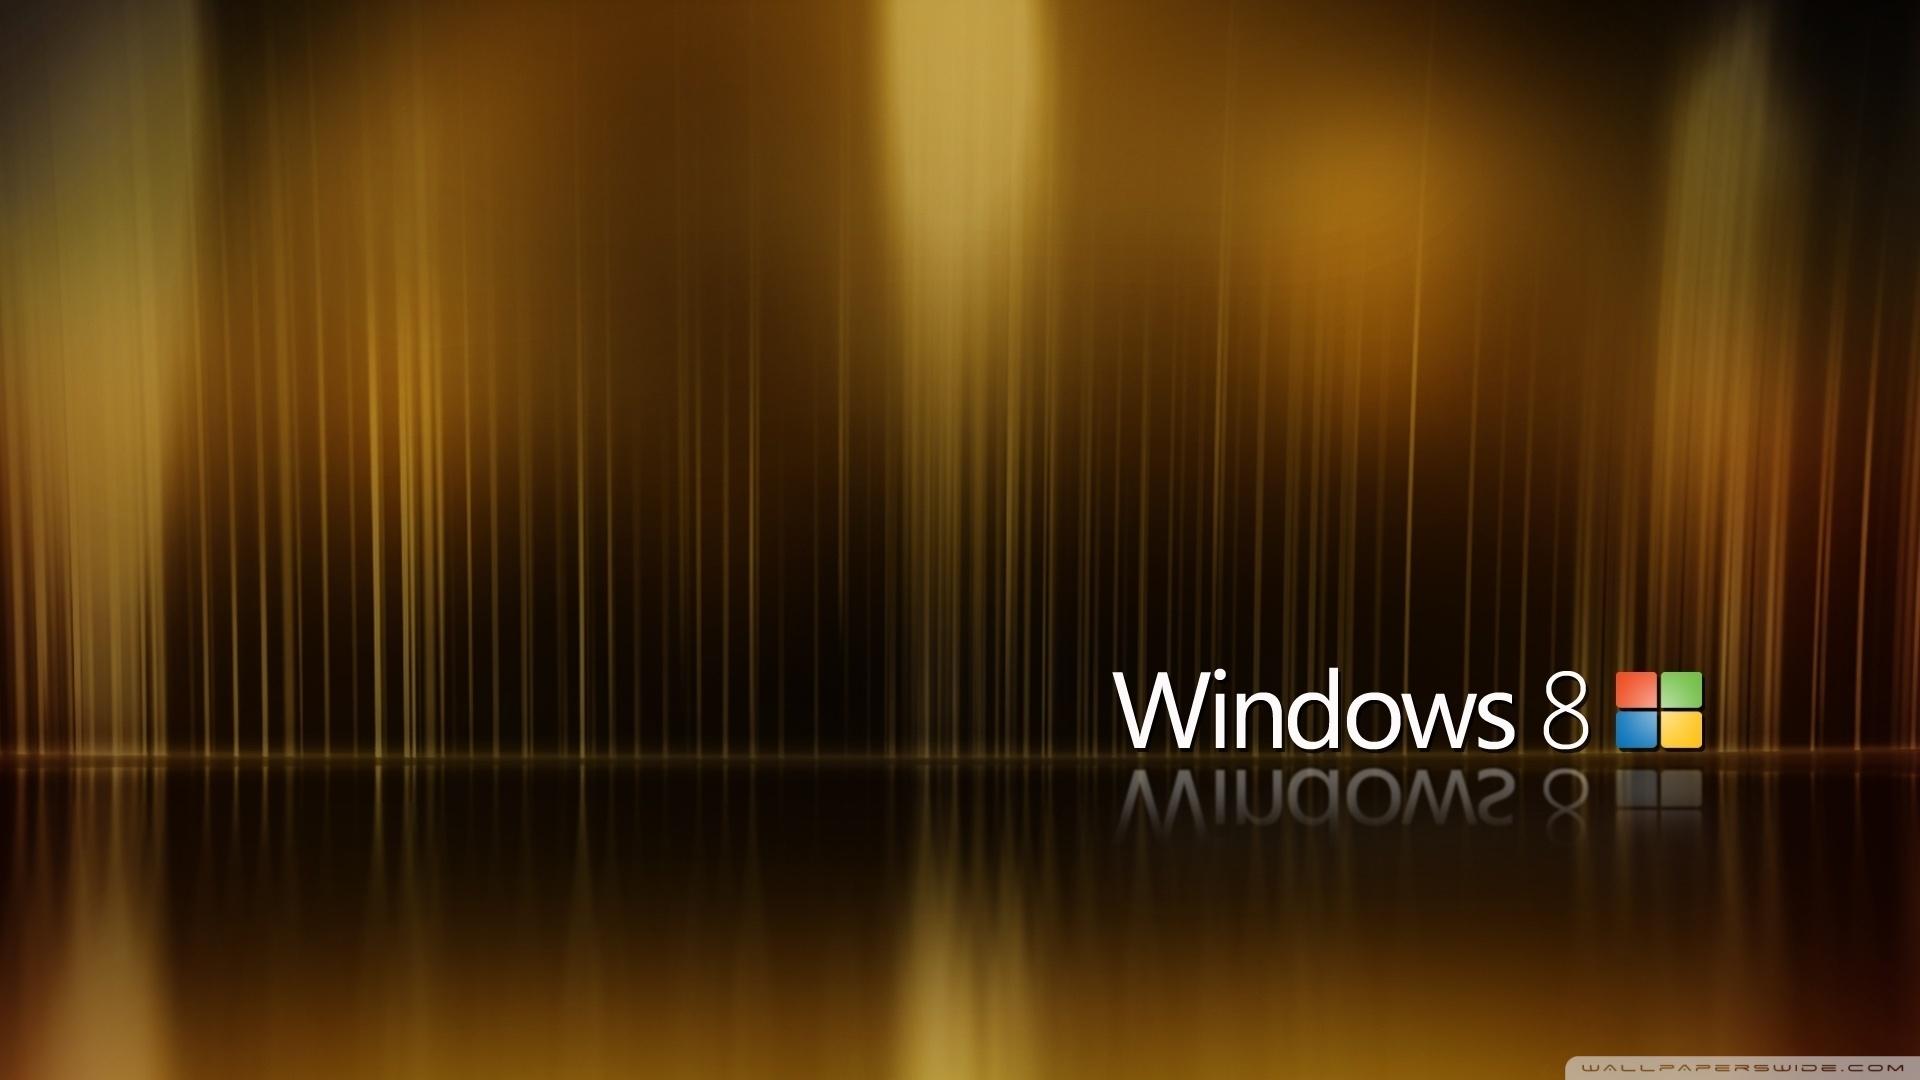 windows 8 ❤ 4k hd desktop wallpaper for 4k ultra hd tv • tablet